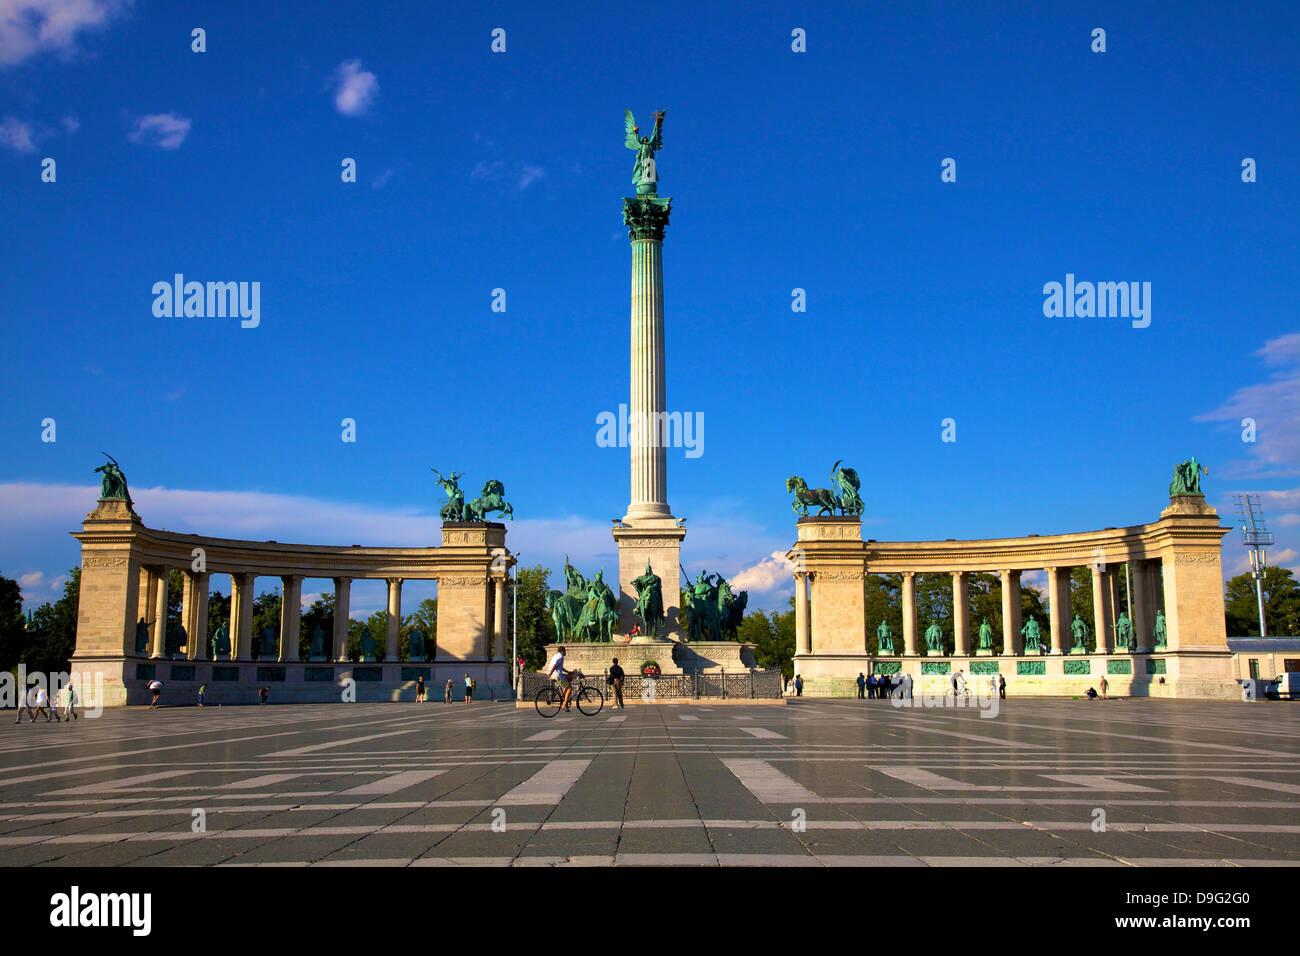 Milleniumsdenkmal, Heldenplatz, Budapest, Ungarn Stockbild